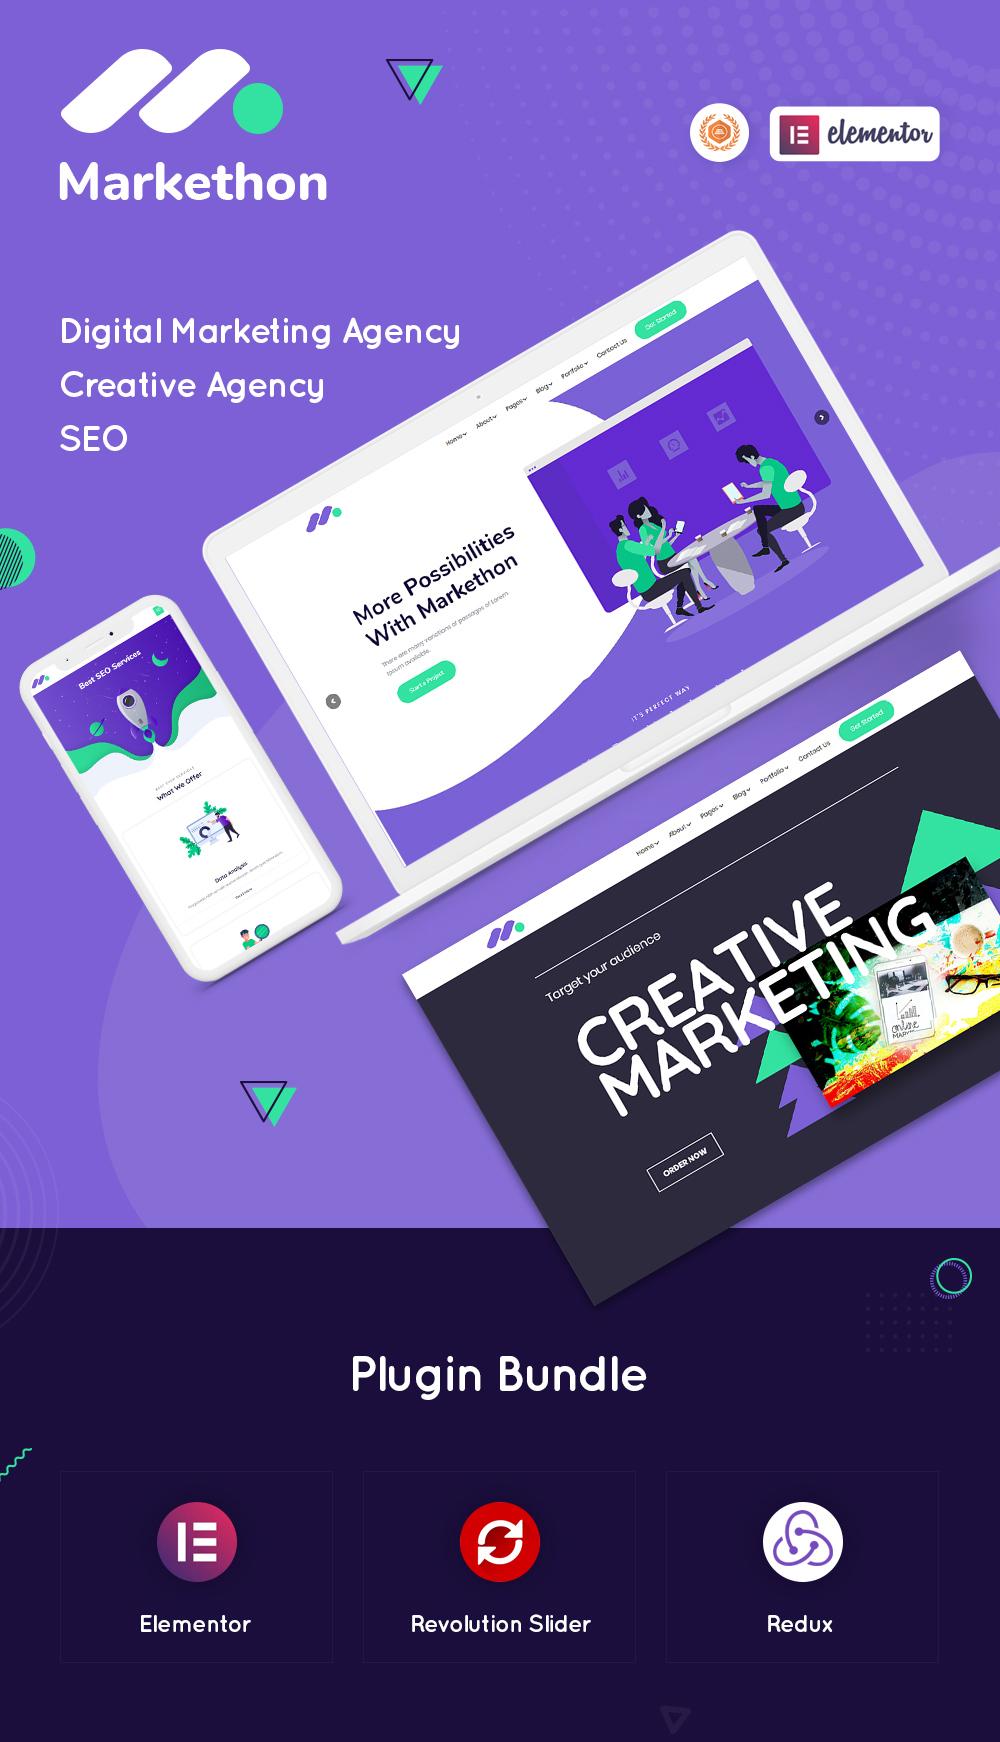 Markethon - SEO & Digital Marketing Agency Portfolio WordPress Theme - 5 seo and digital marketing agency portfolio wordpress theme Markethon part 1